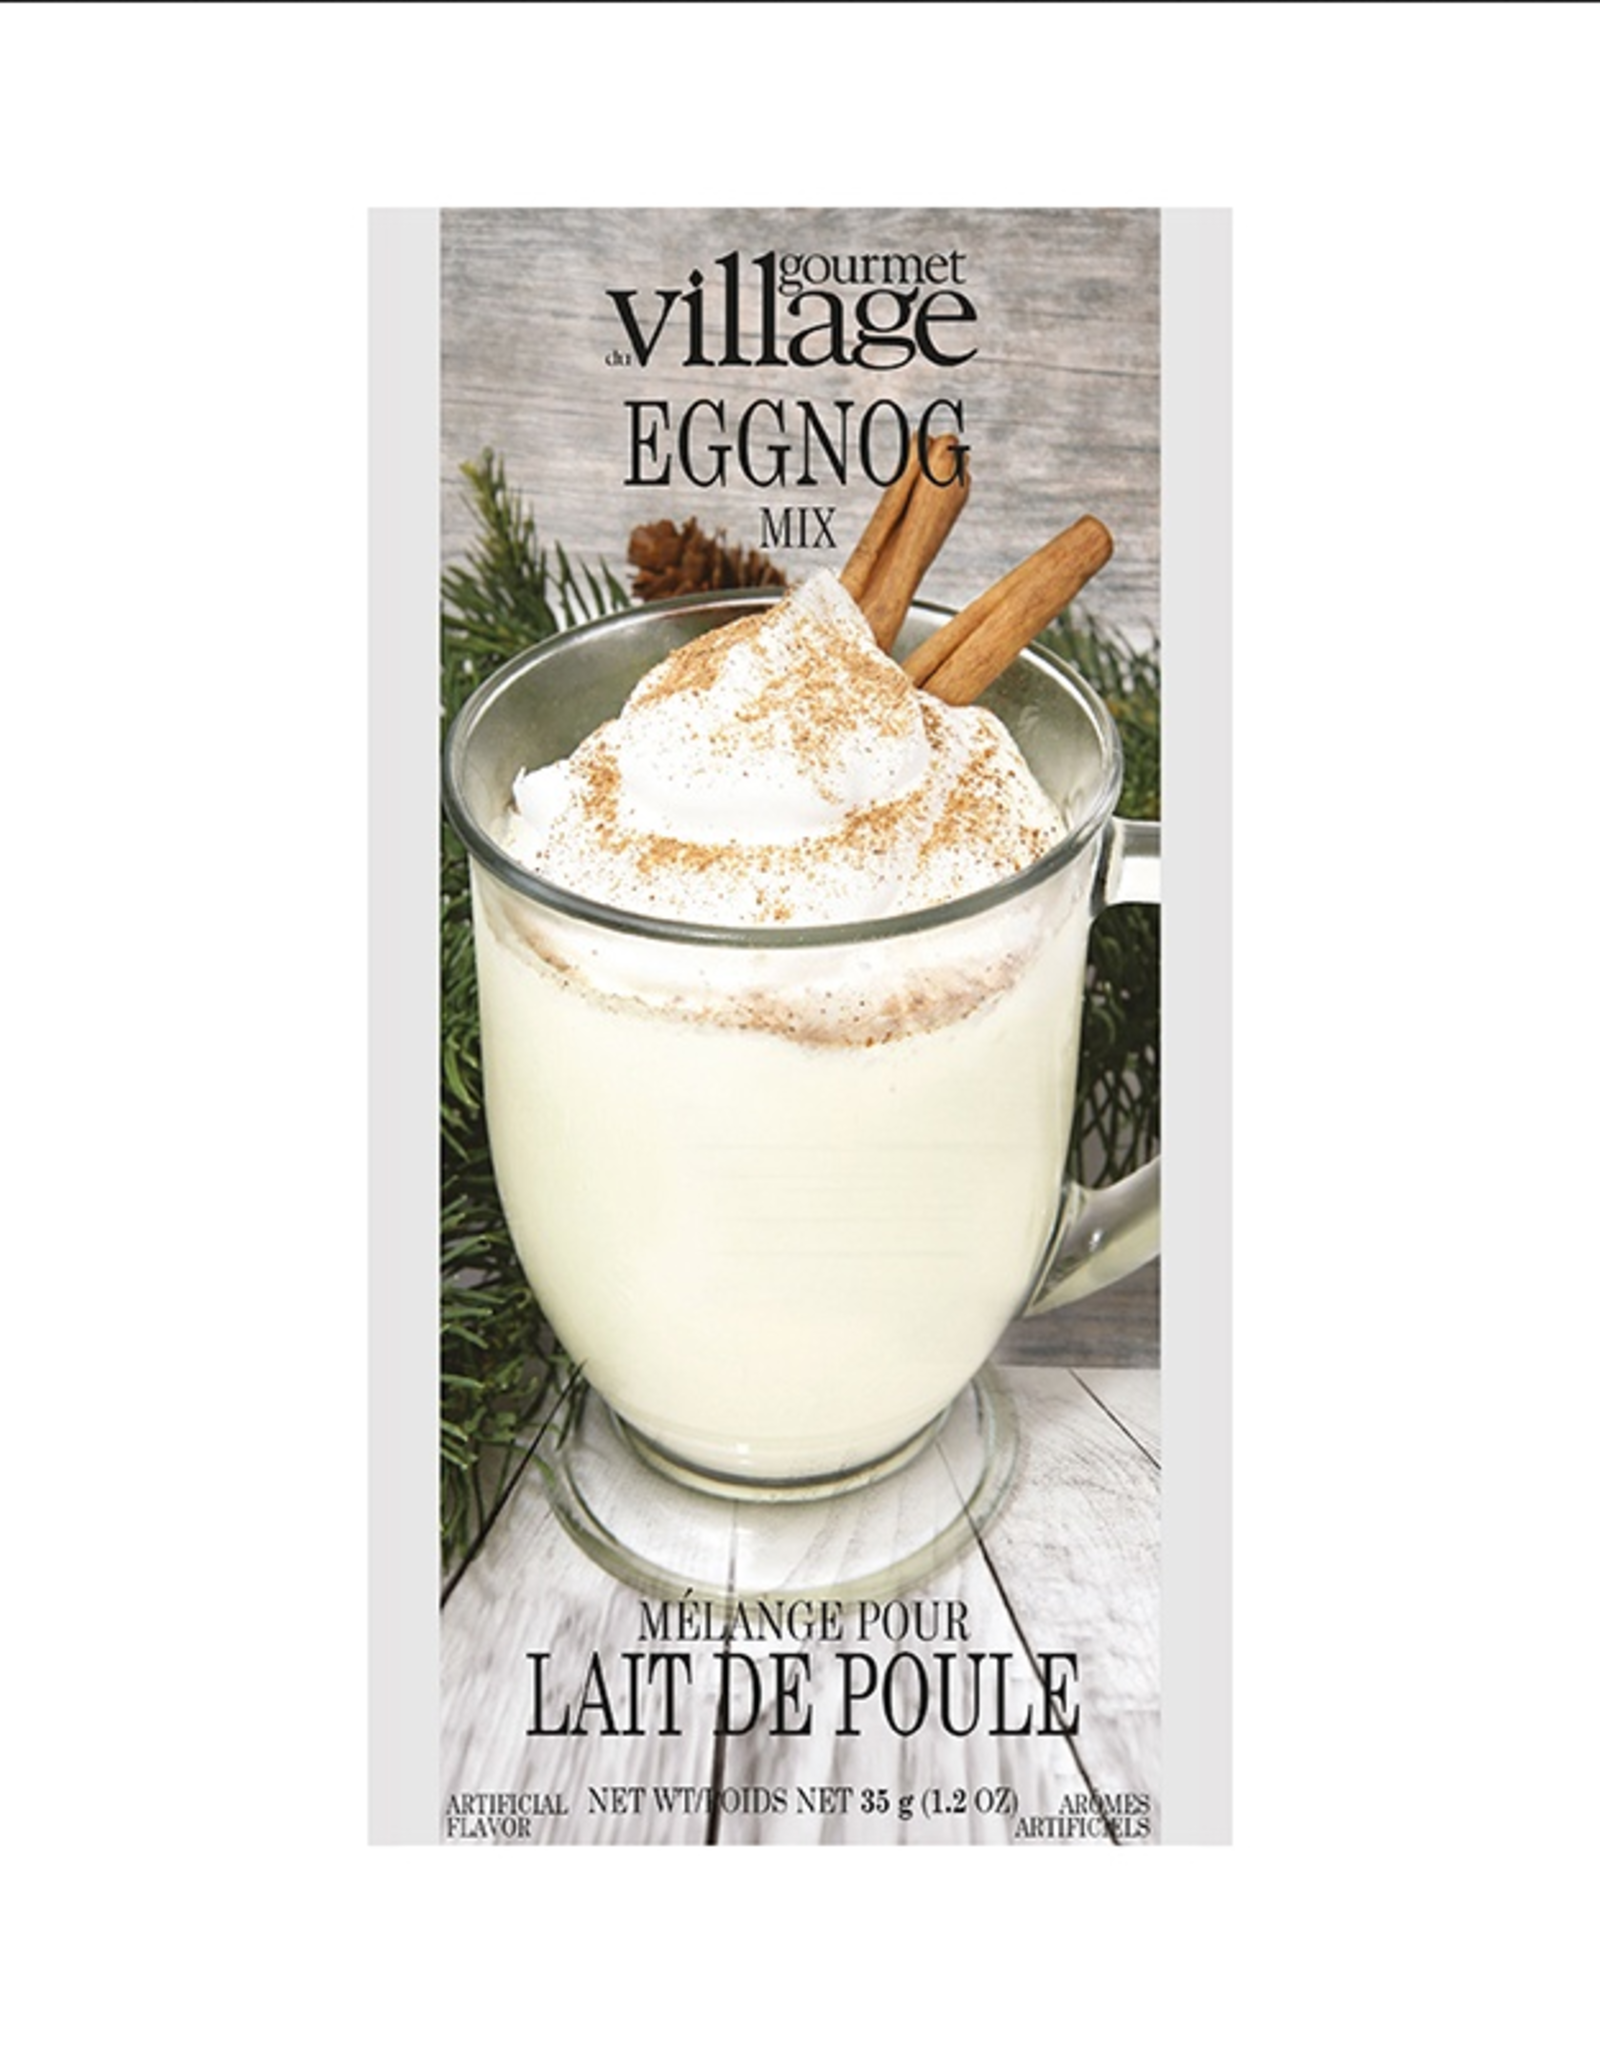 Gourmet Village Eggnog Mix